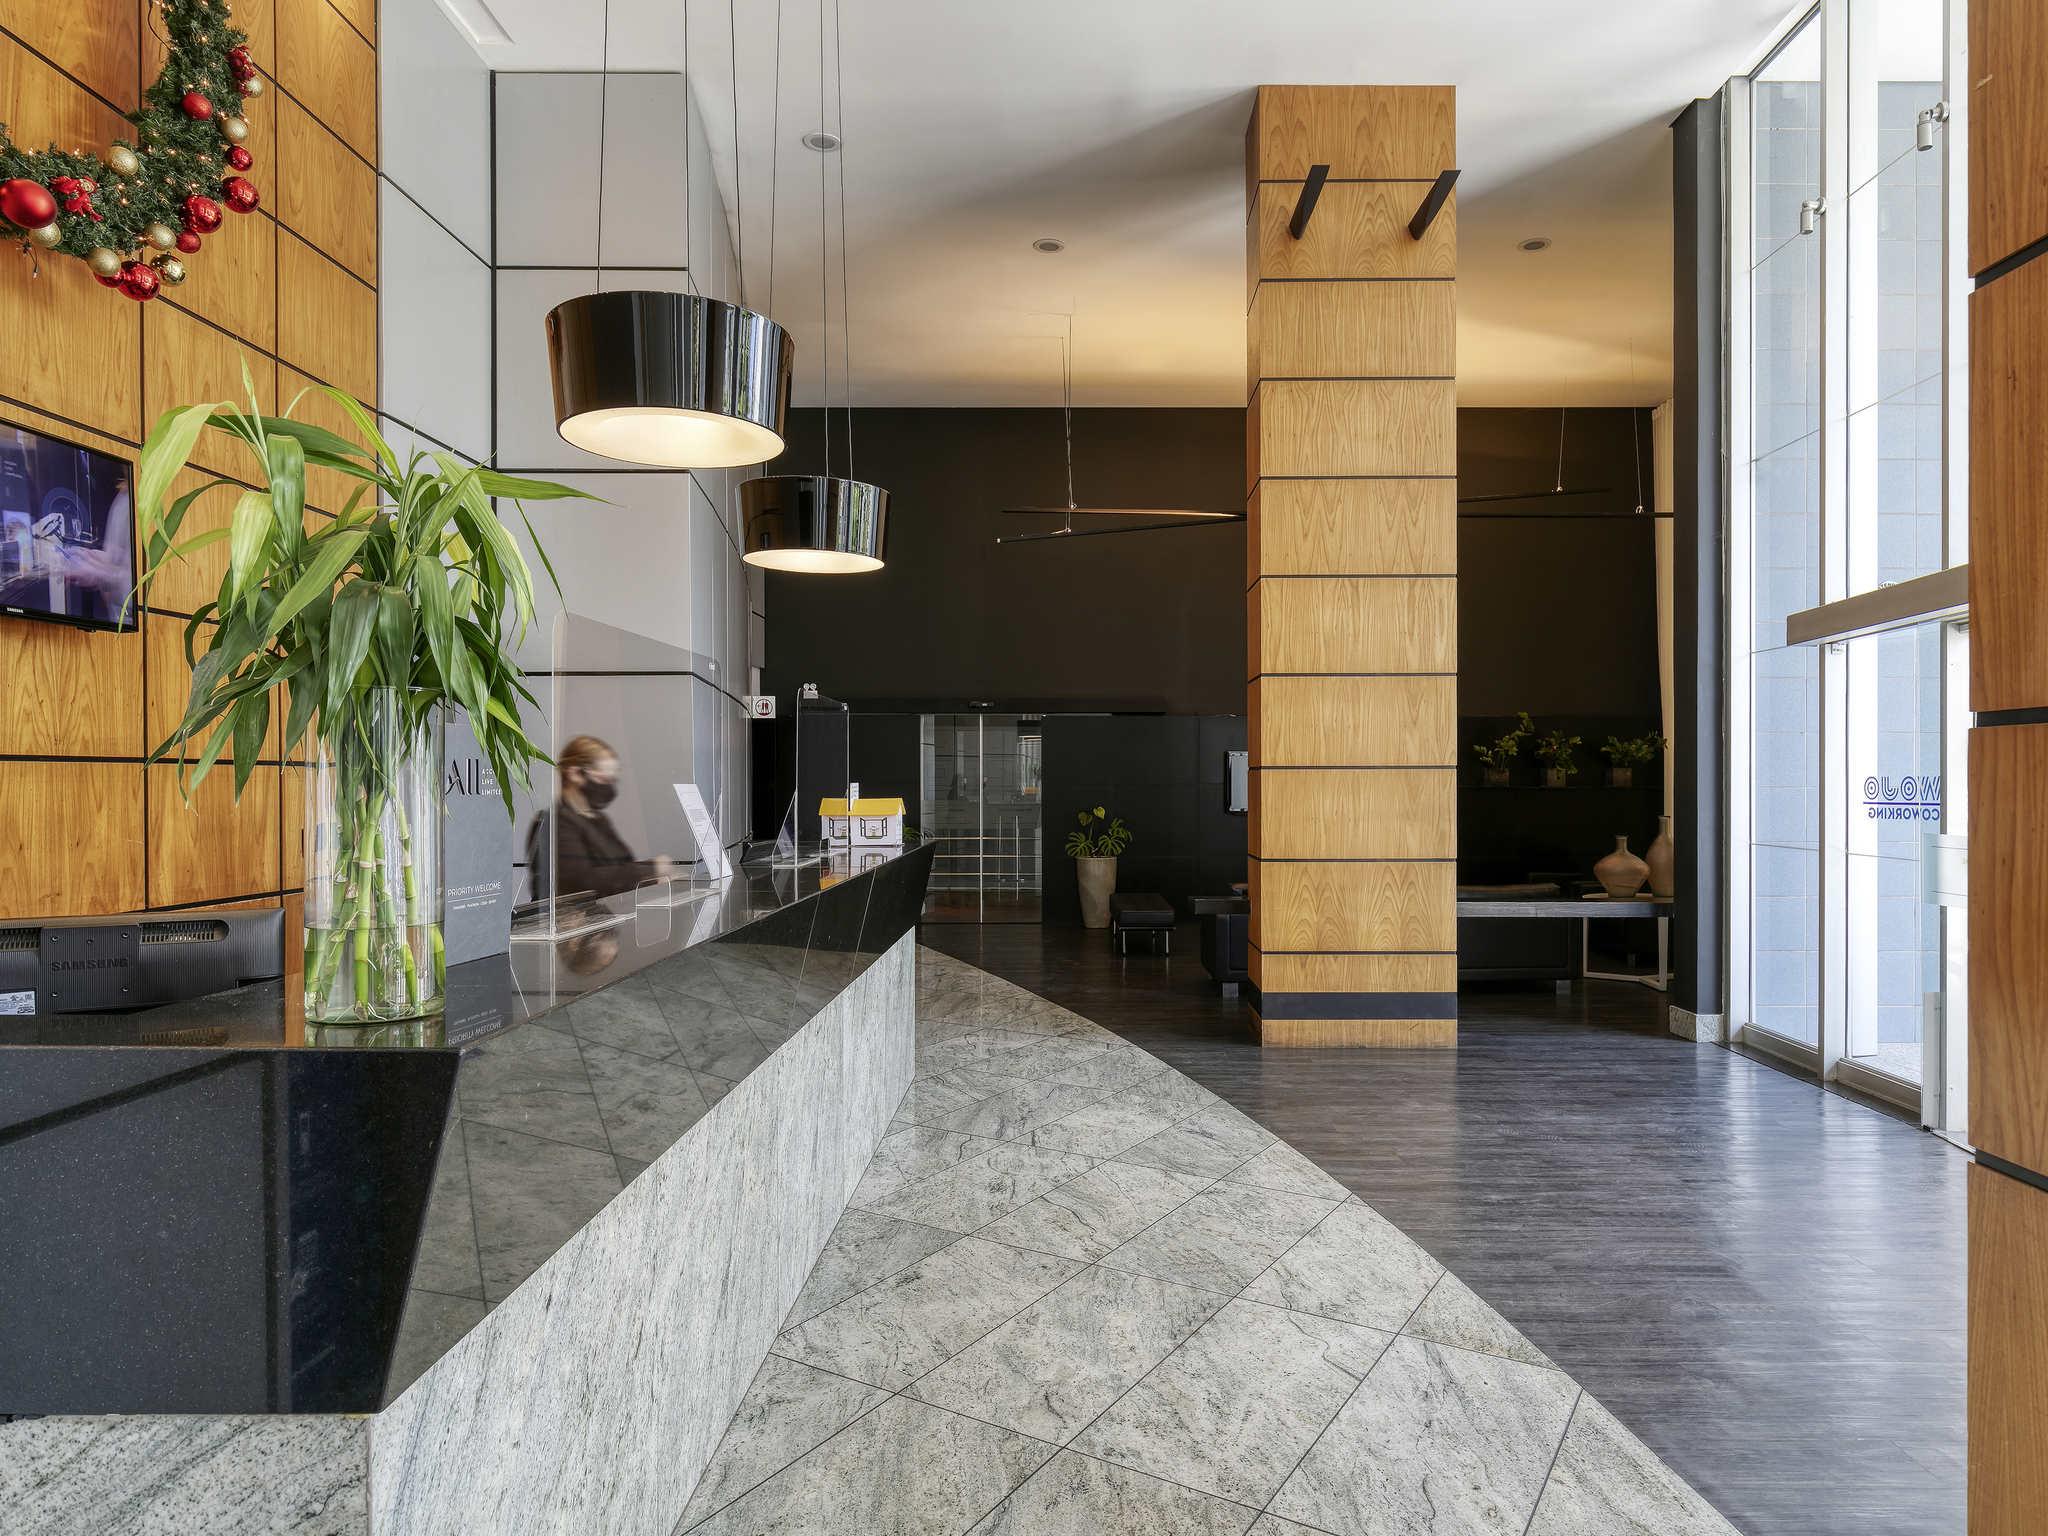 cd28debcc75 Hotel em BELO HORIZONTE - Mercure Belo Horizonte Savassi Hotel